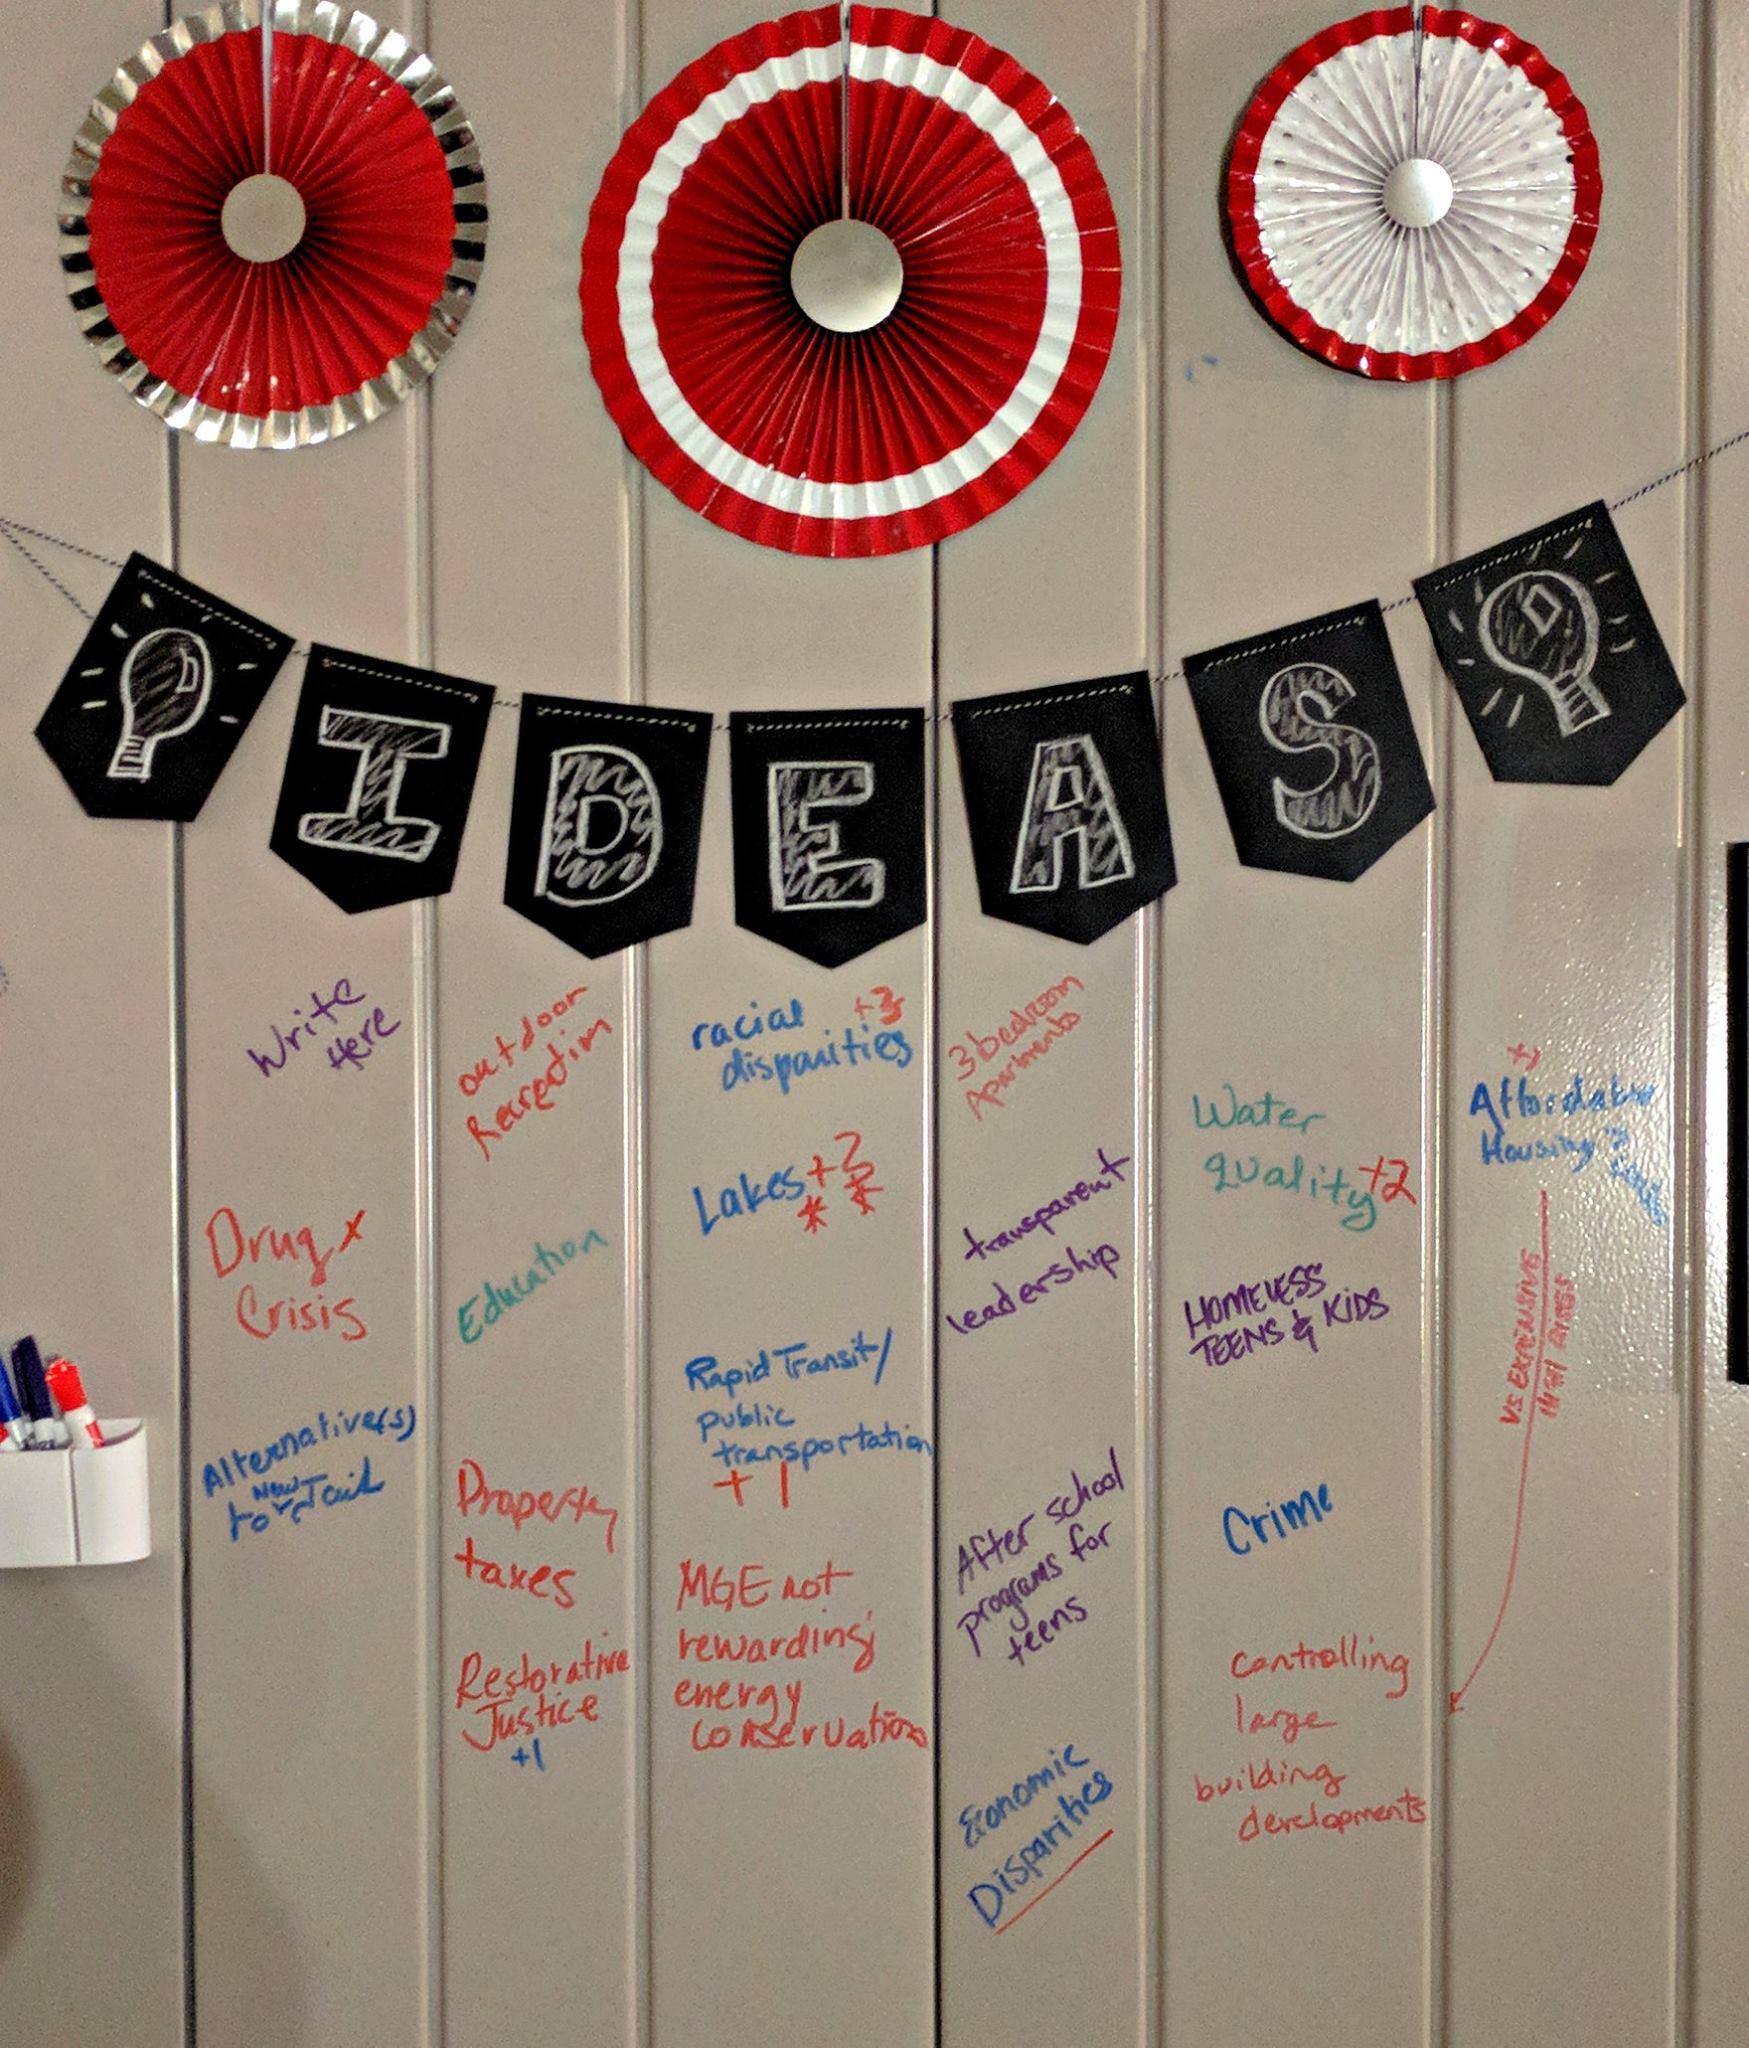 Ideas from neighbors